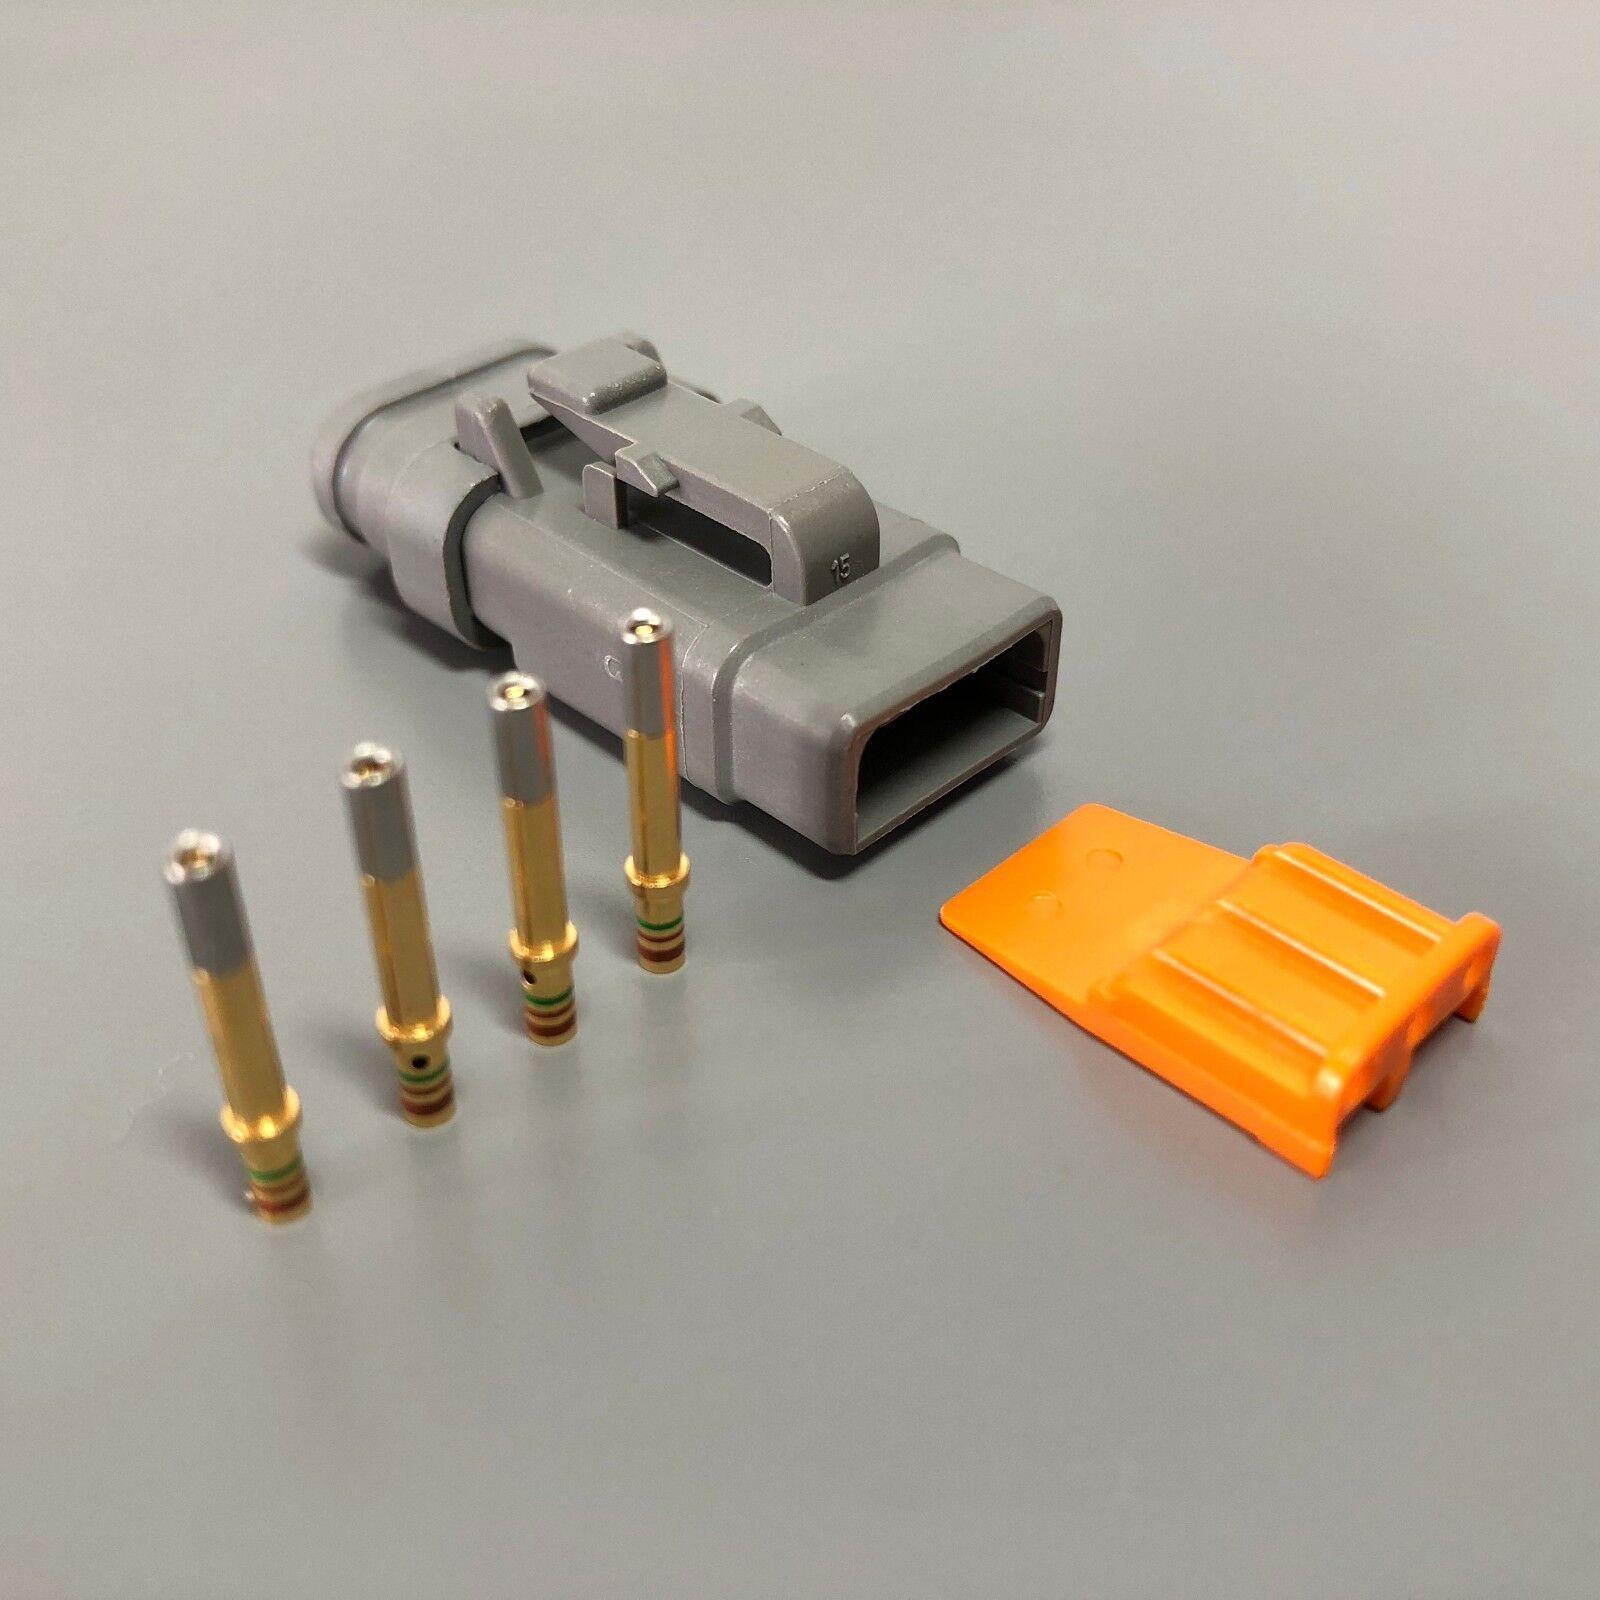 5x Deutsch DTM 3-Way Socket Connector Kit 24-20 AWG Gold Contact Plug DTM06-3S